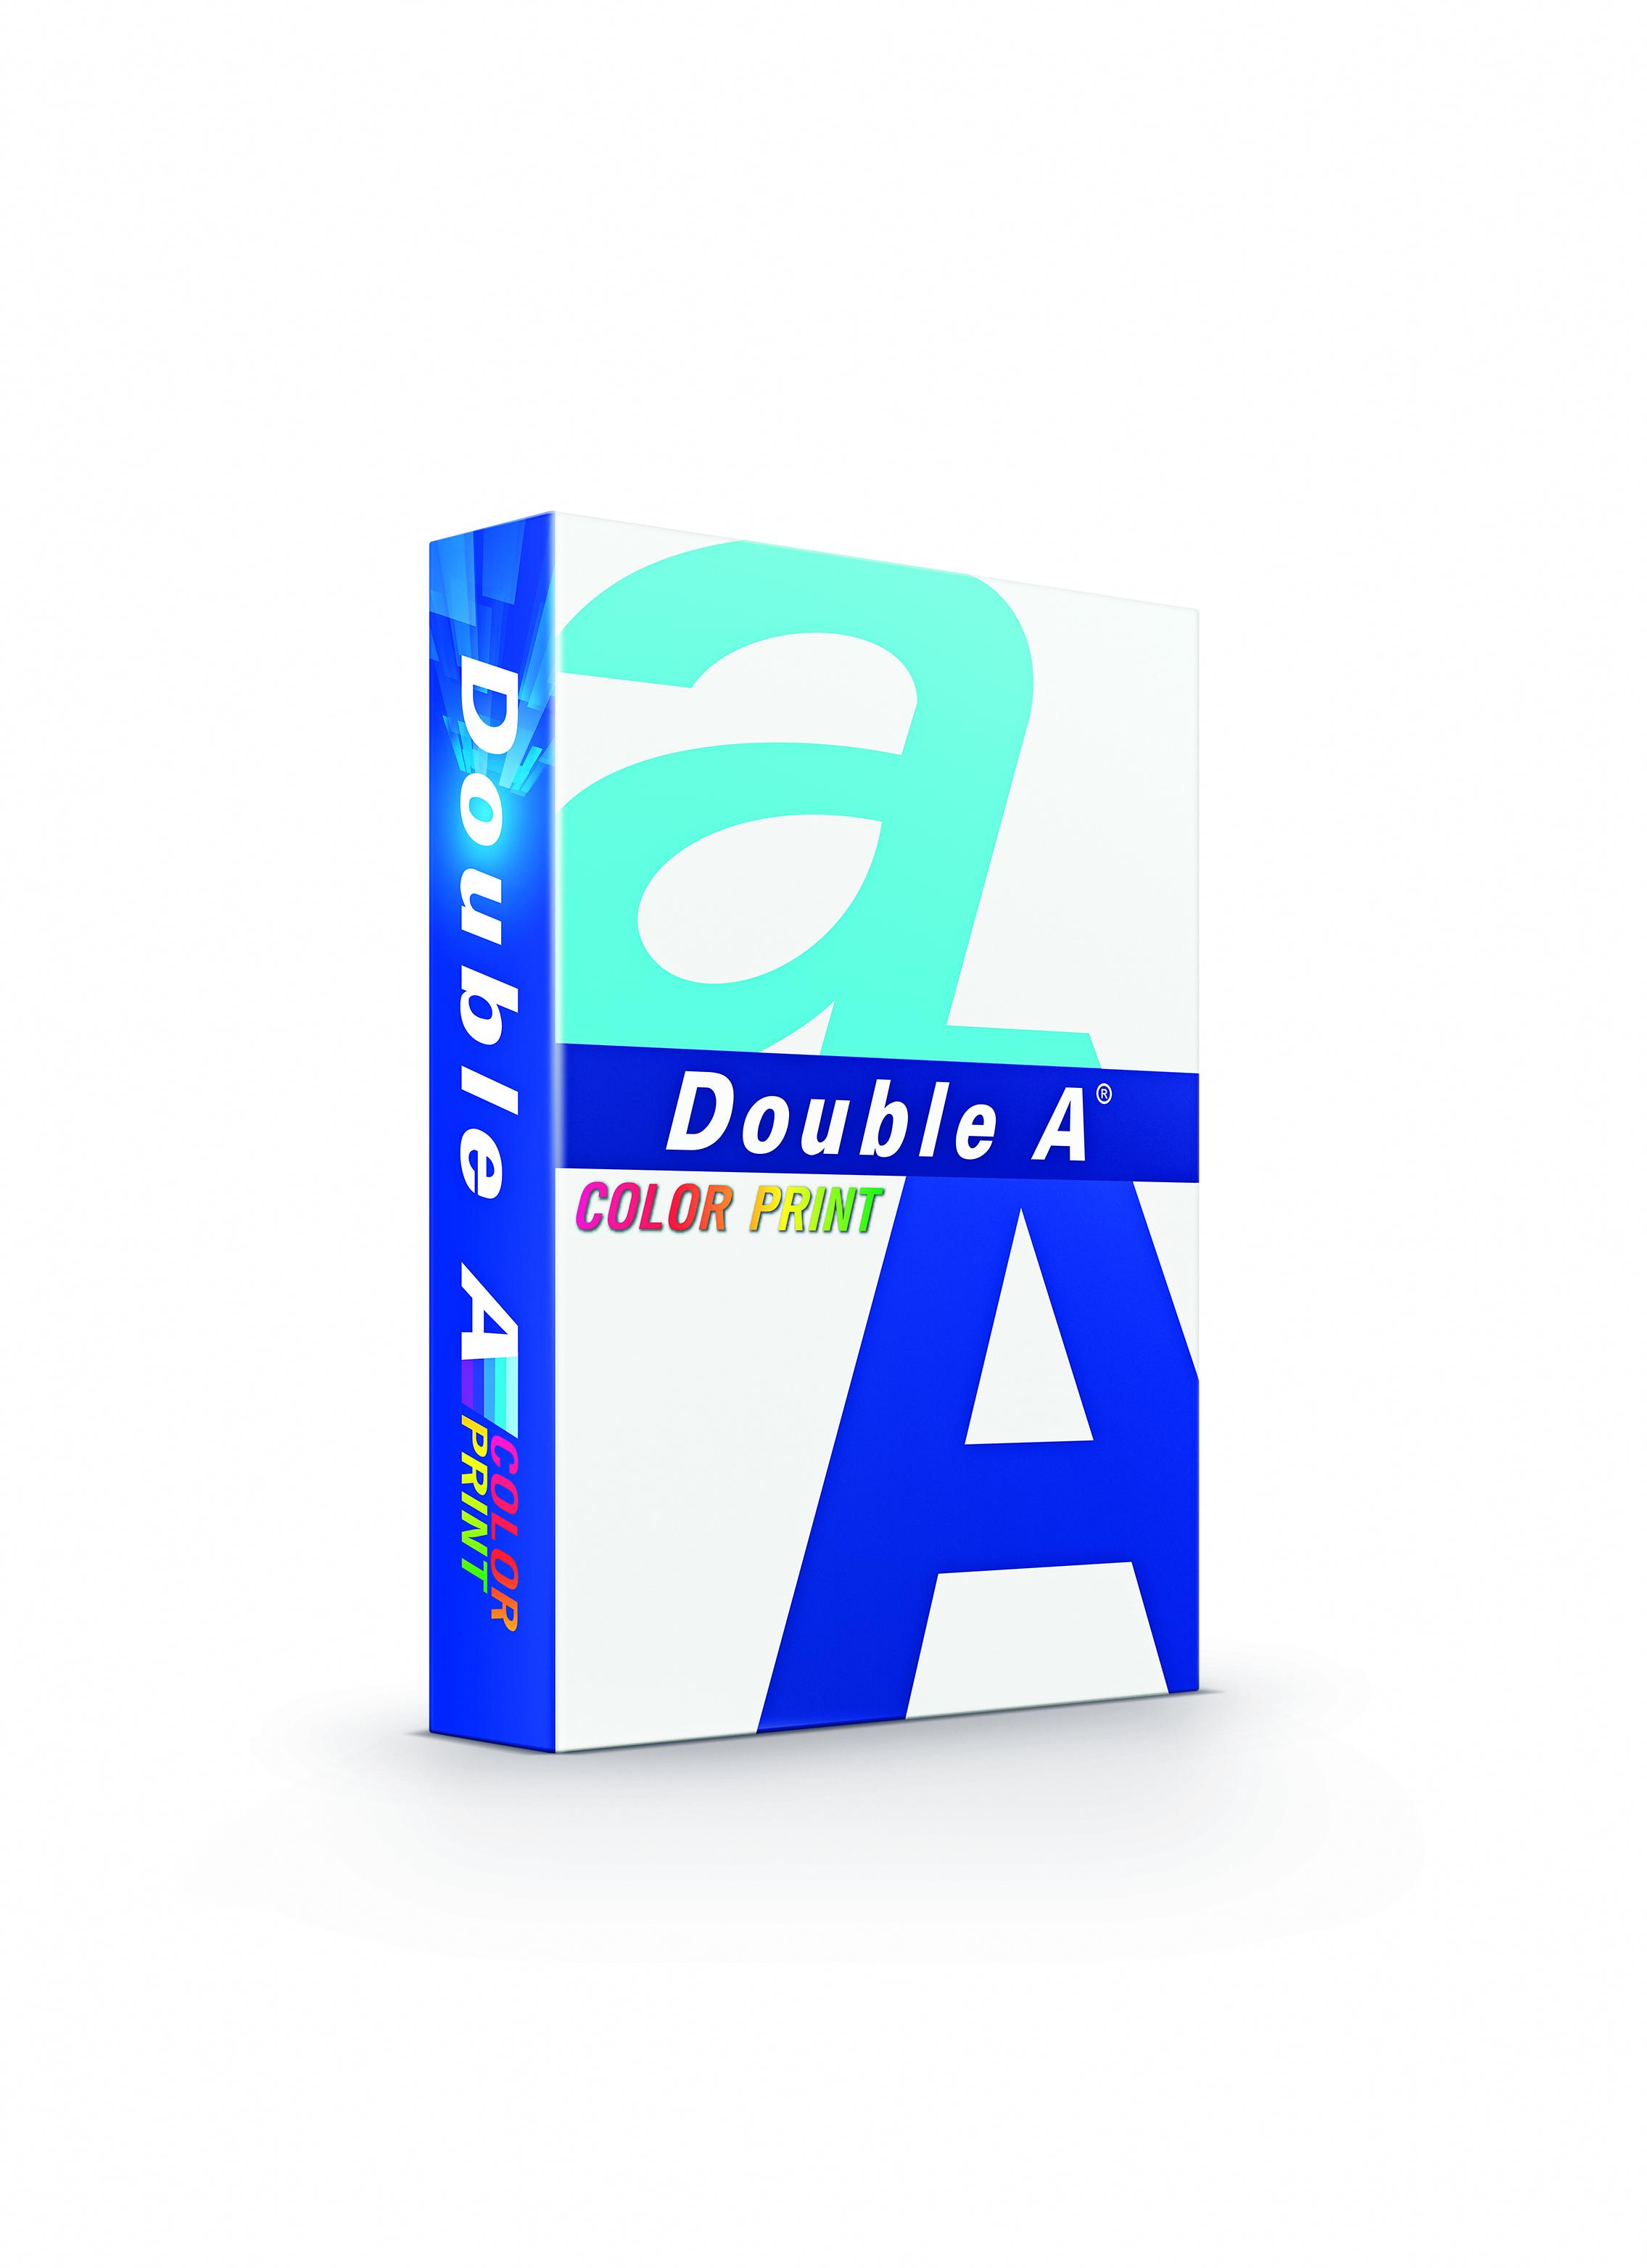 Double A Color Print Papier 90g/m² DIN-A4 weiß 500 Blatt